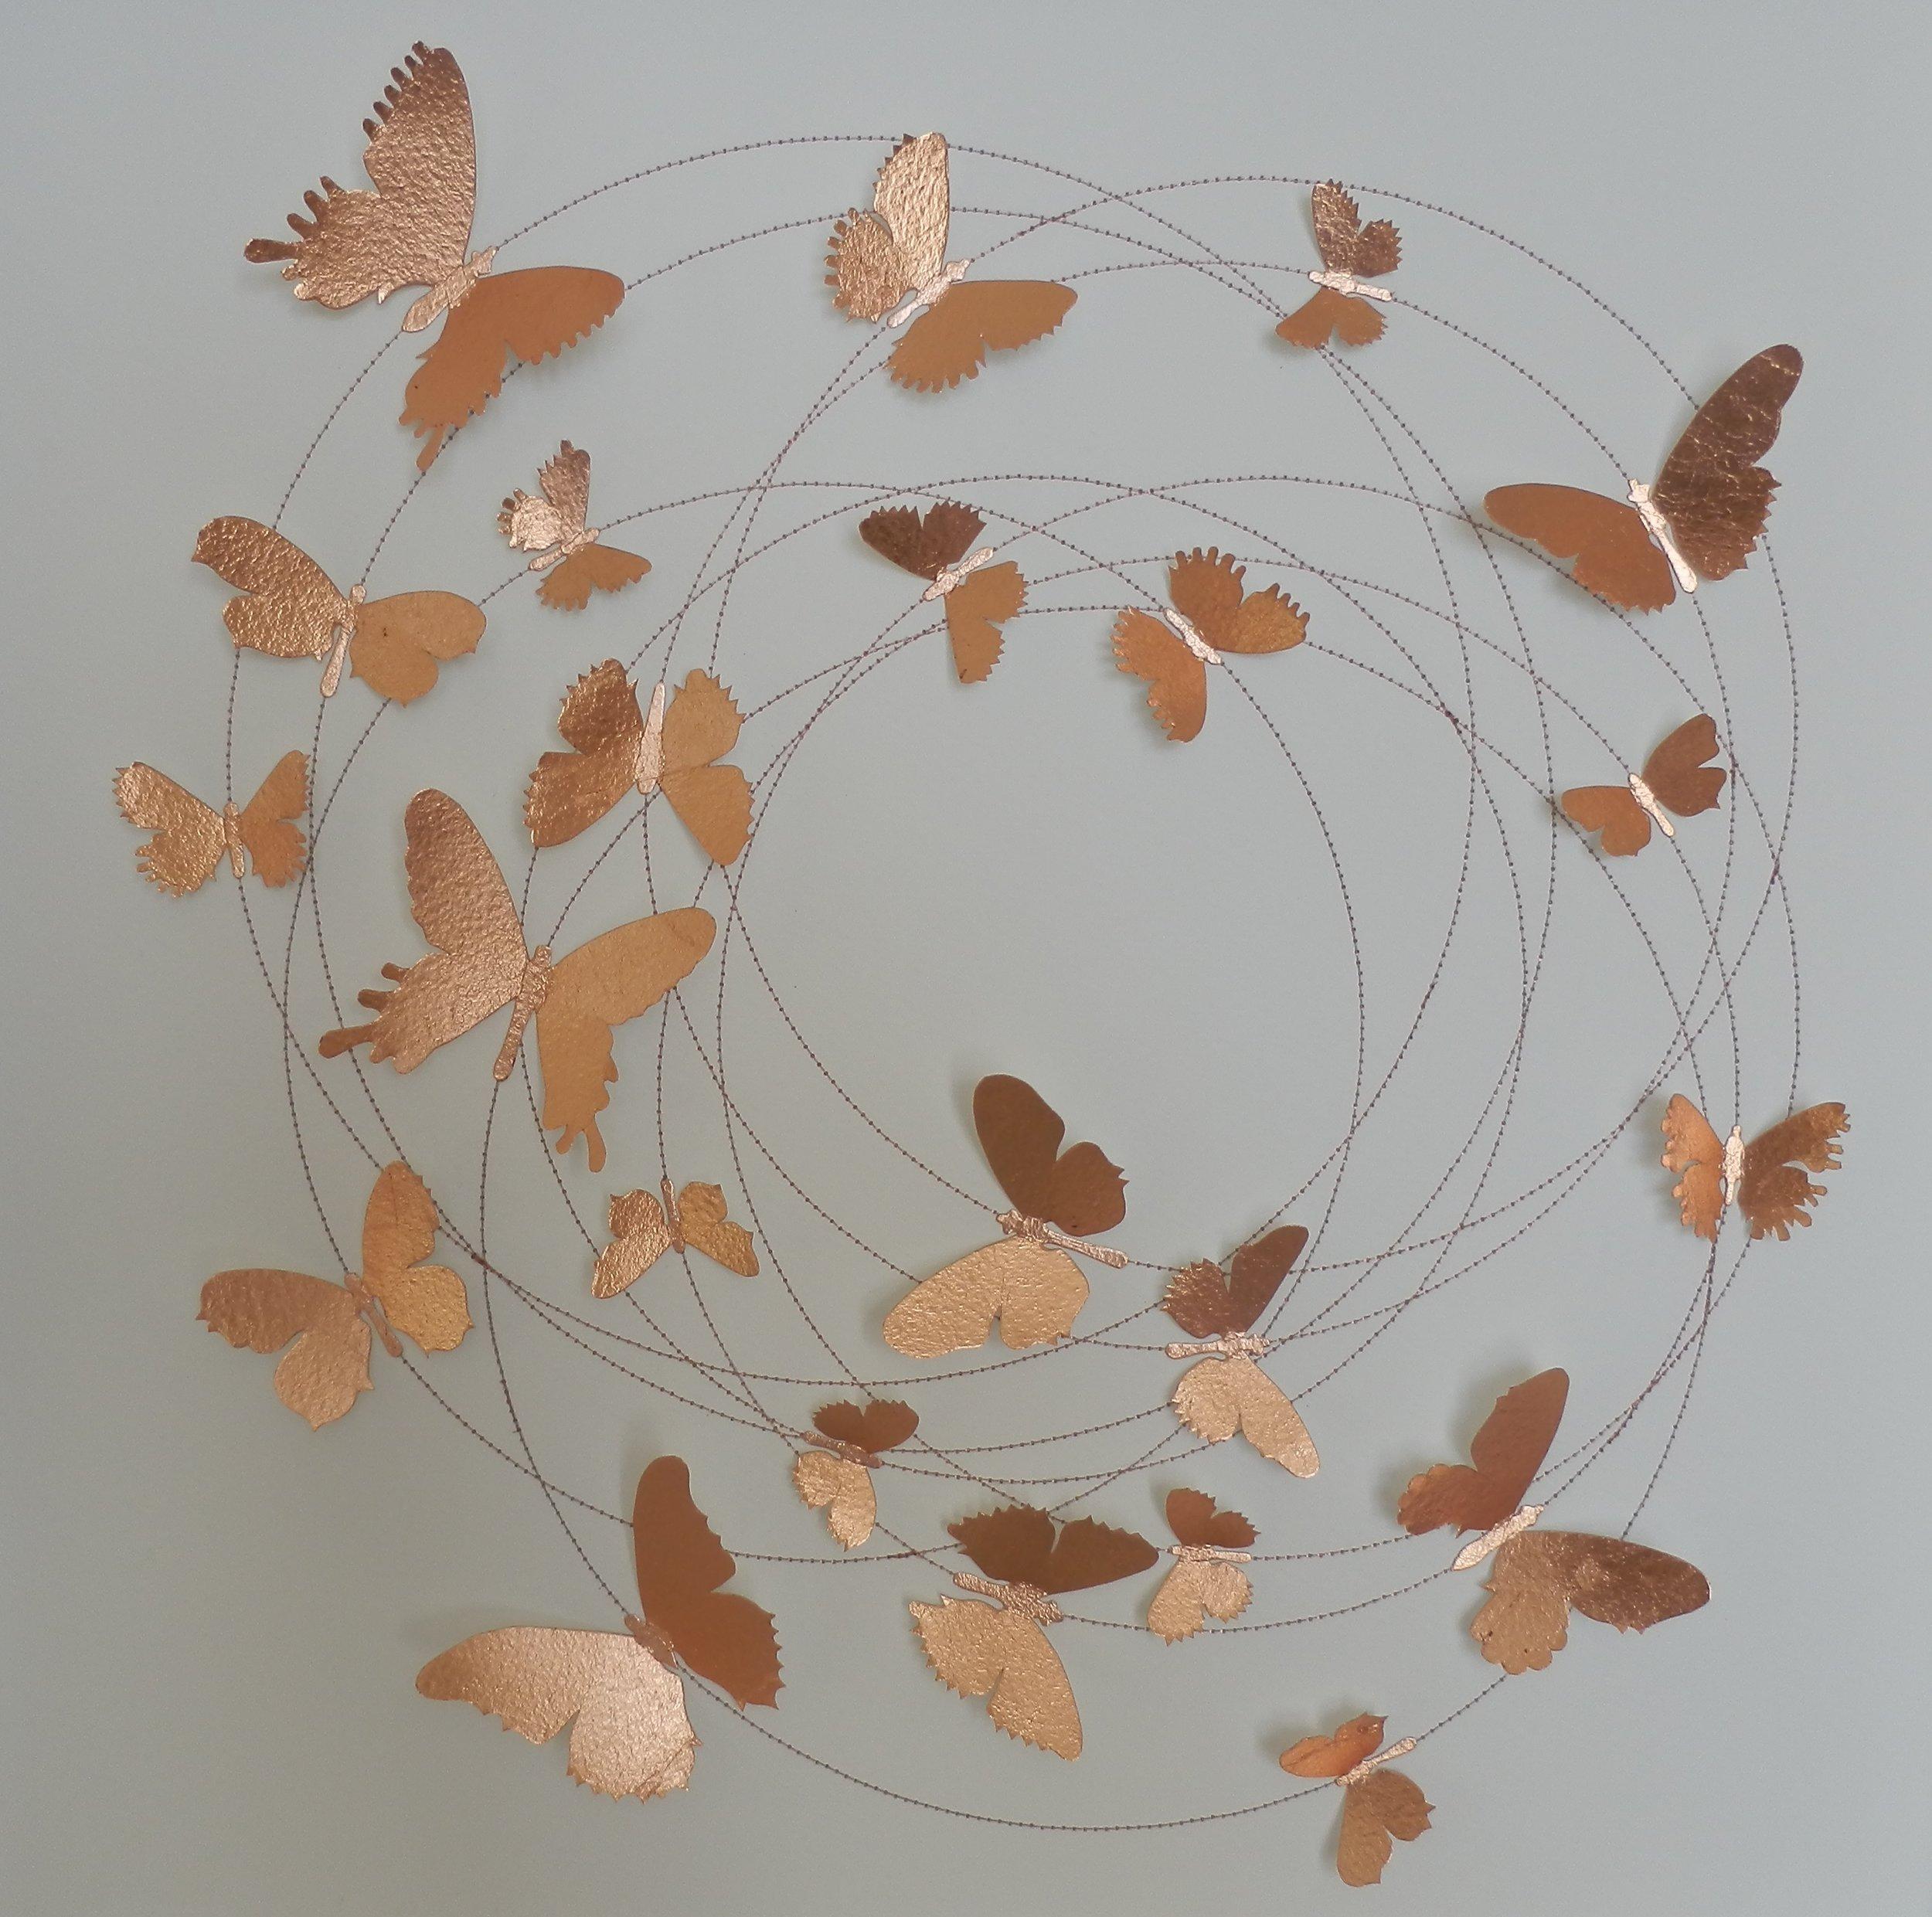 Rabble  Copper  53 x 53 cm